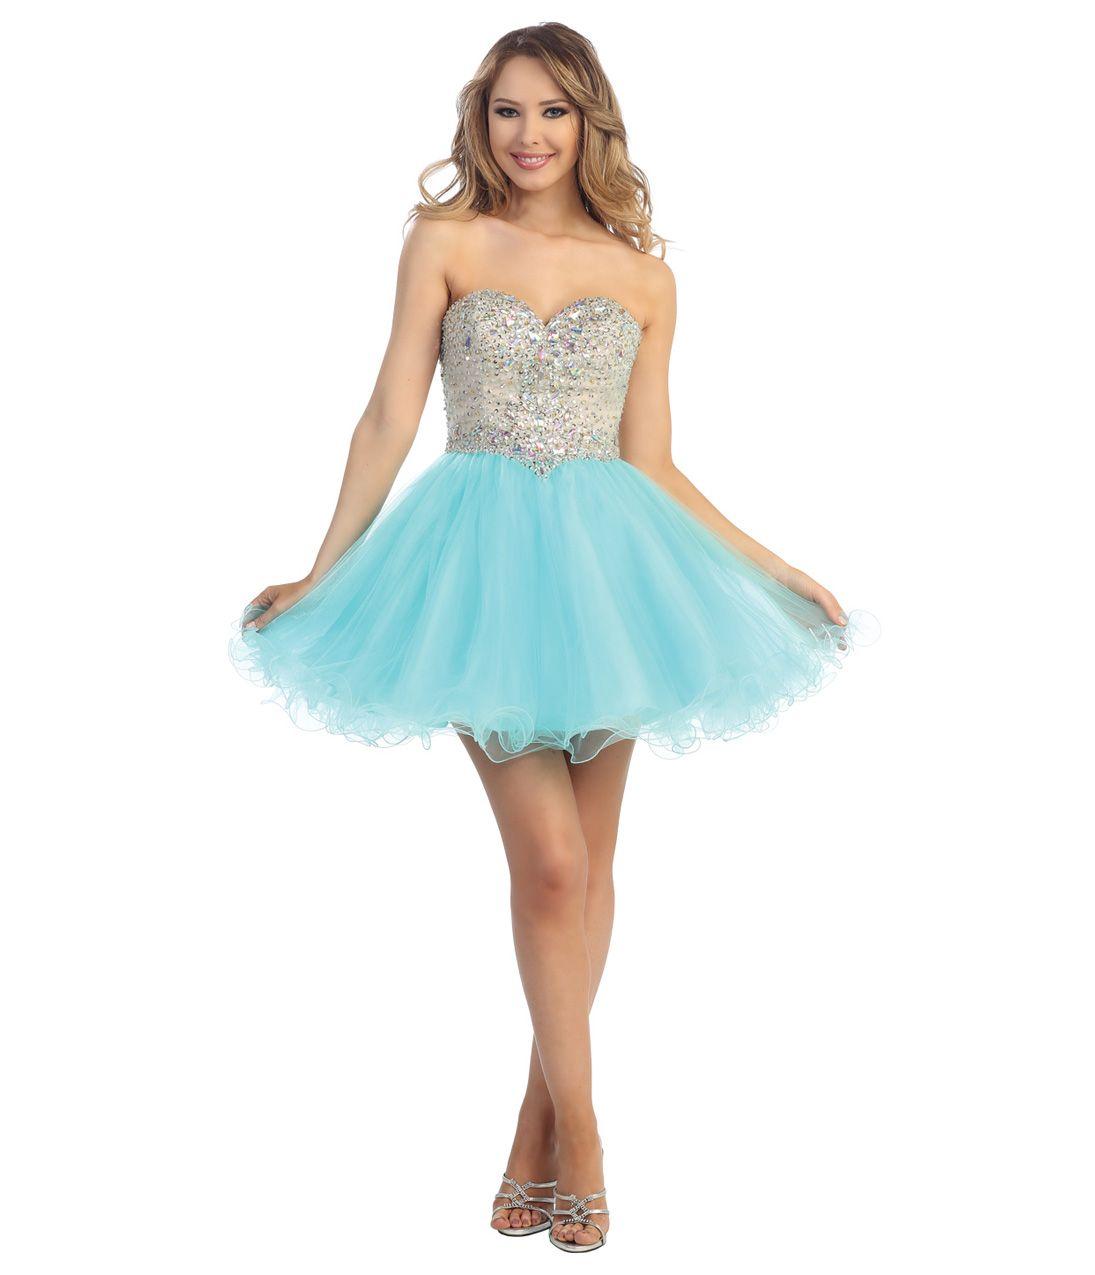 Aqua & Nude Tulle & Beaded Strapless Sweetheart Short Dress ...